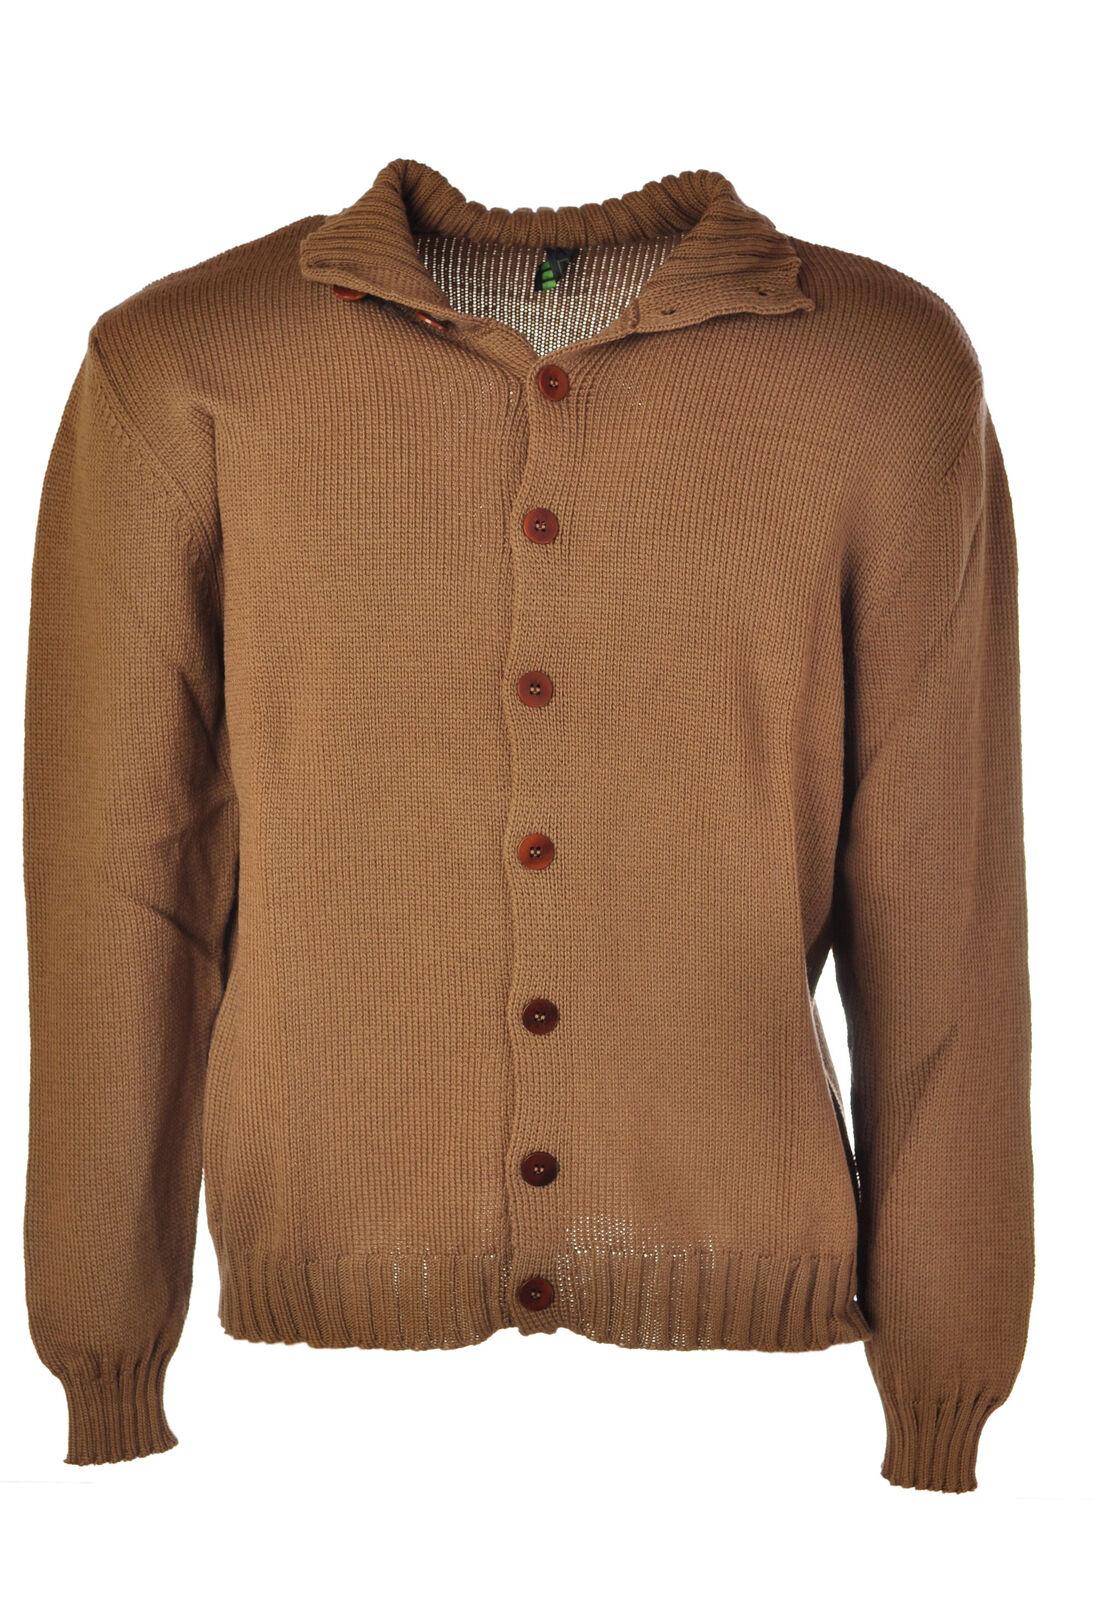 Almeria  -  Sweaters - Male - Beige - 2833831N173720